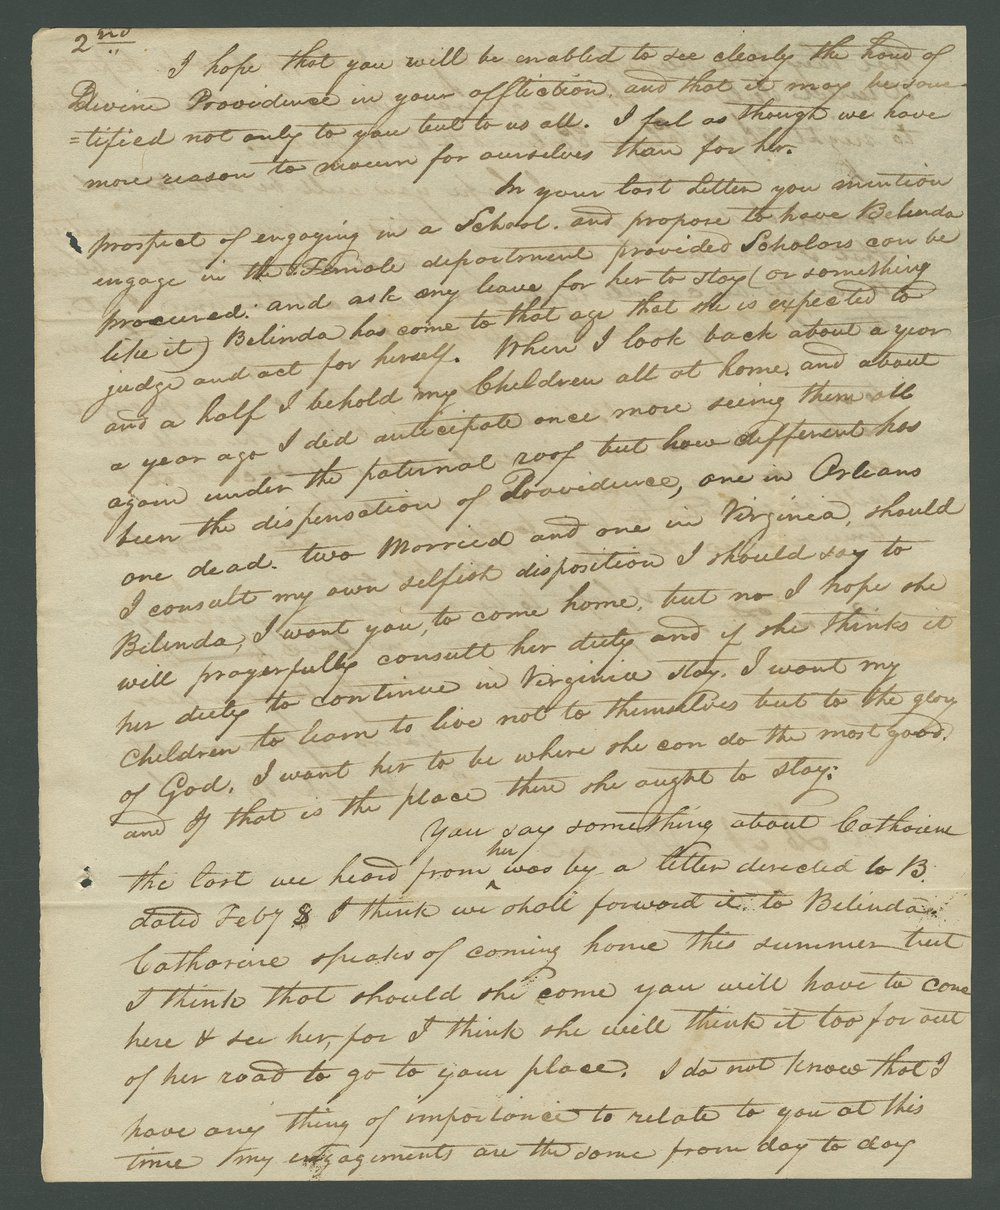 Joseph B. Miles to Lewis Allen Alderson - 13